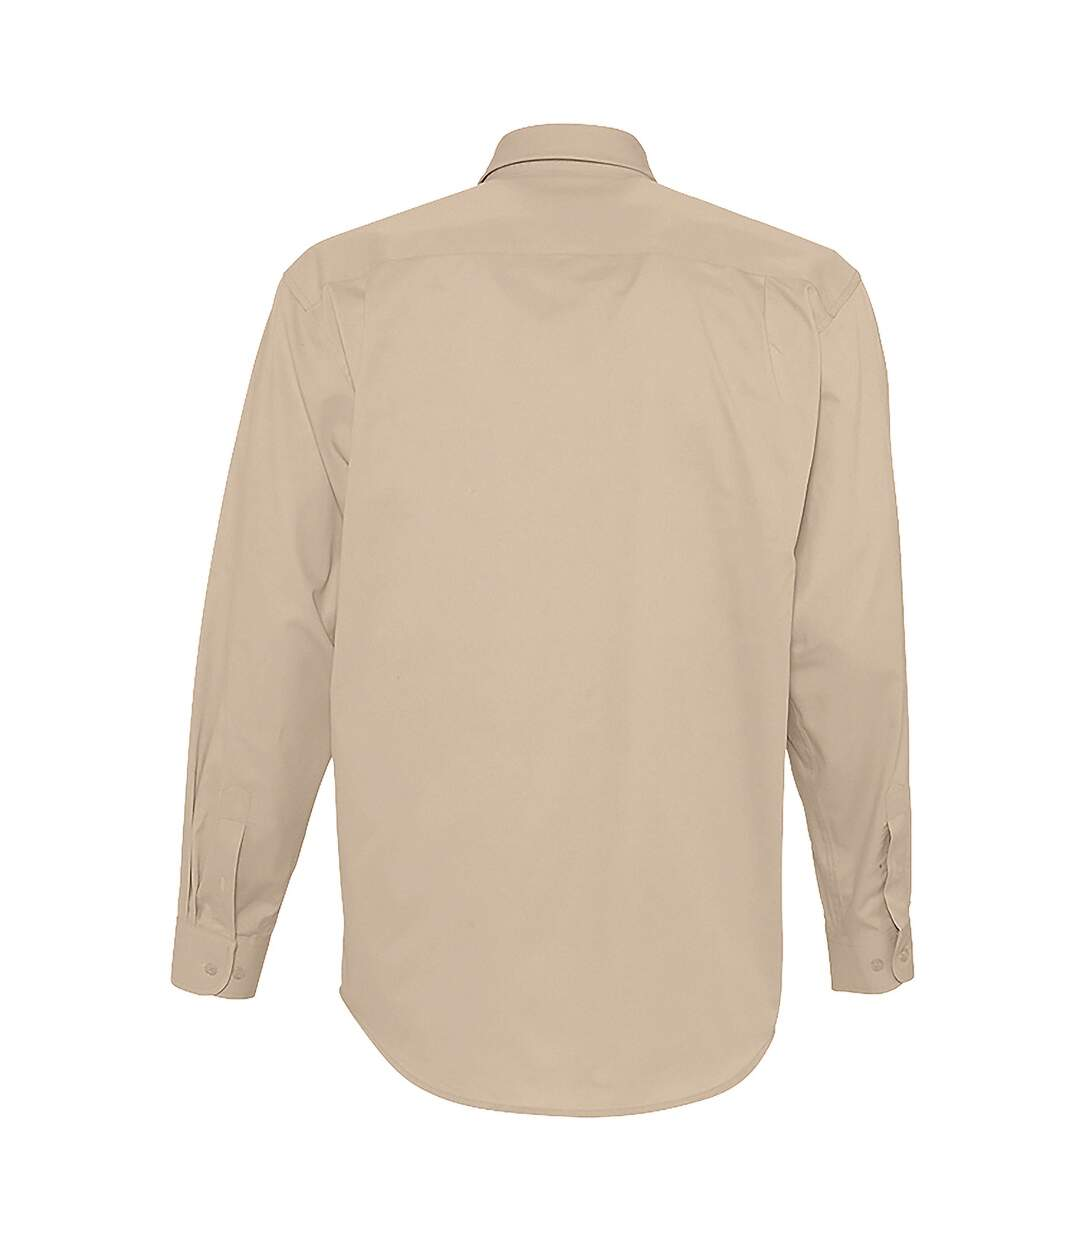 SOLS Mens Bel-Air Long Sleeve Twill Work Shirt (Beige) - UTPC389